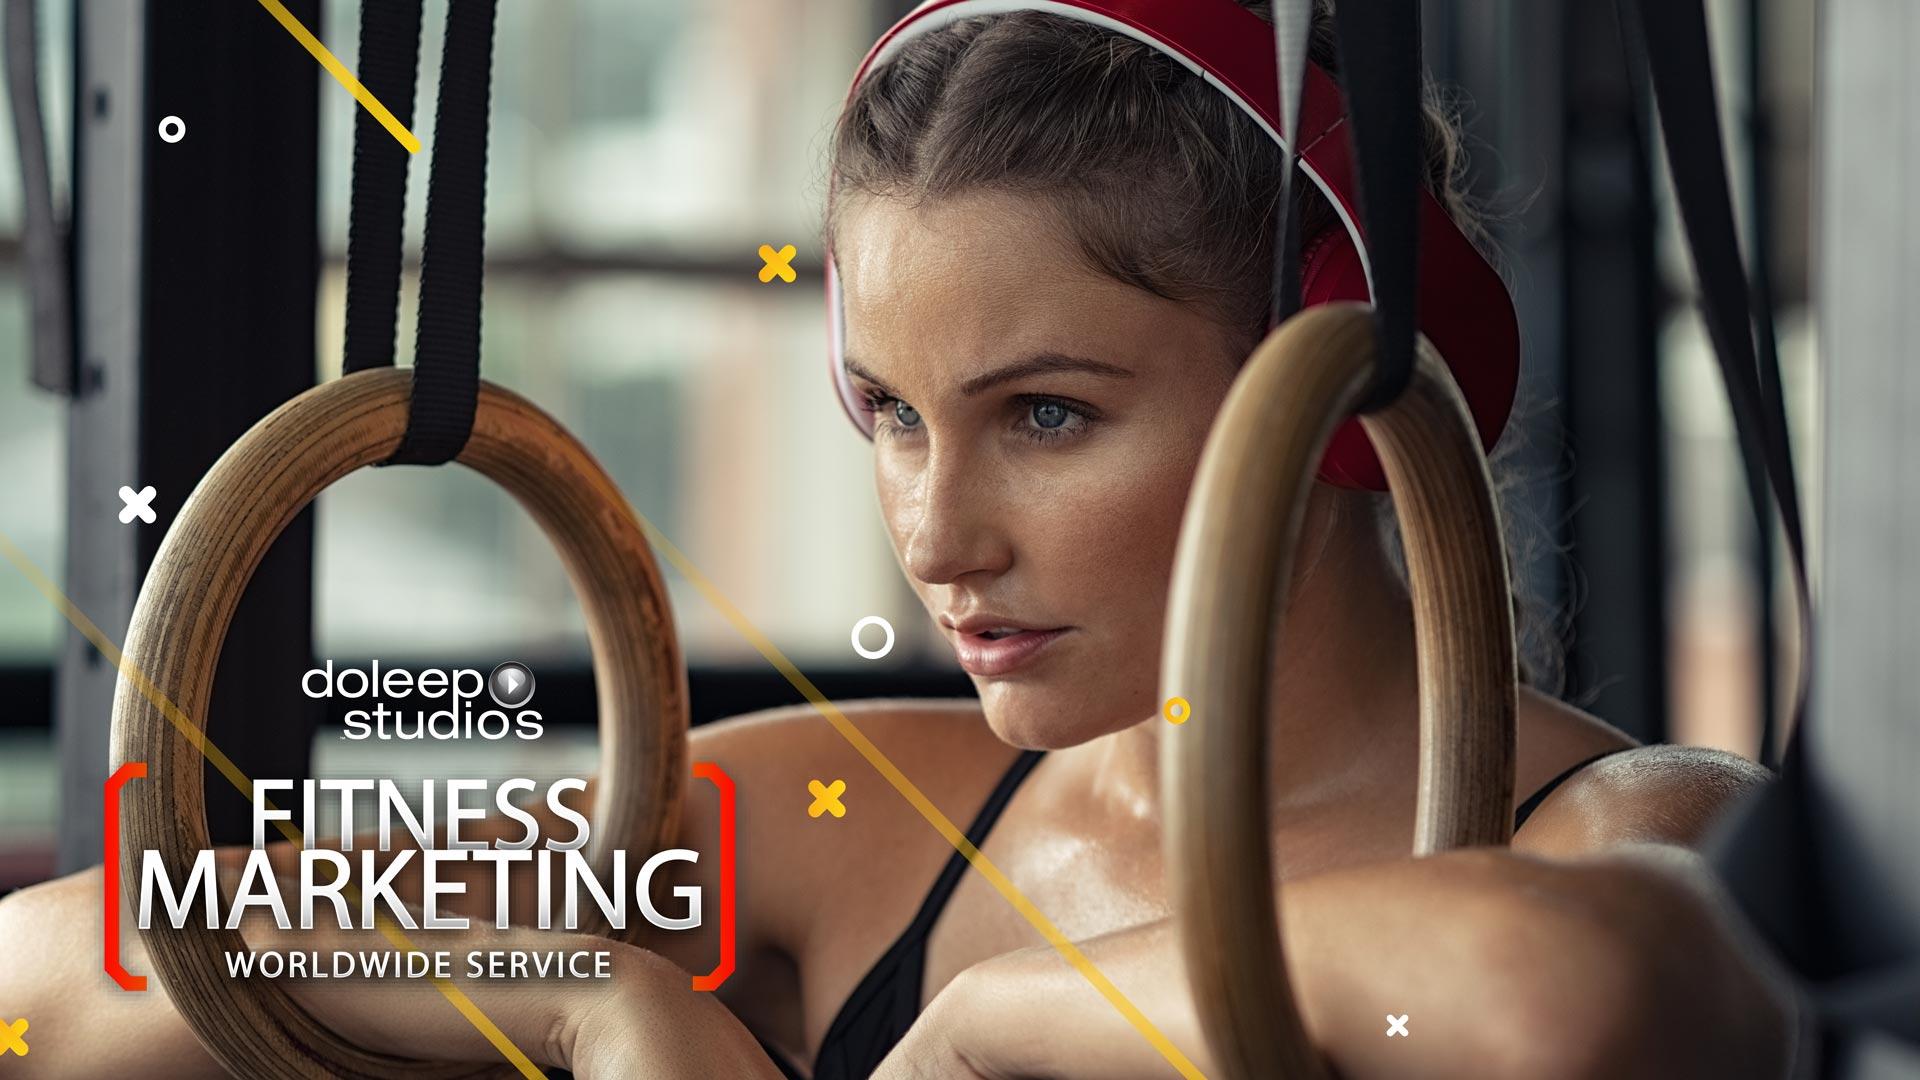 Fitness marketing agency - Doleep Studios